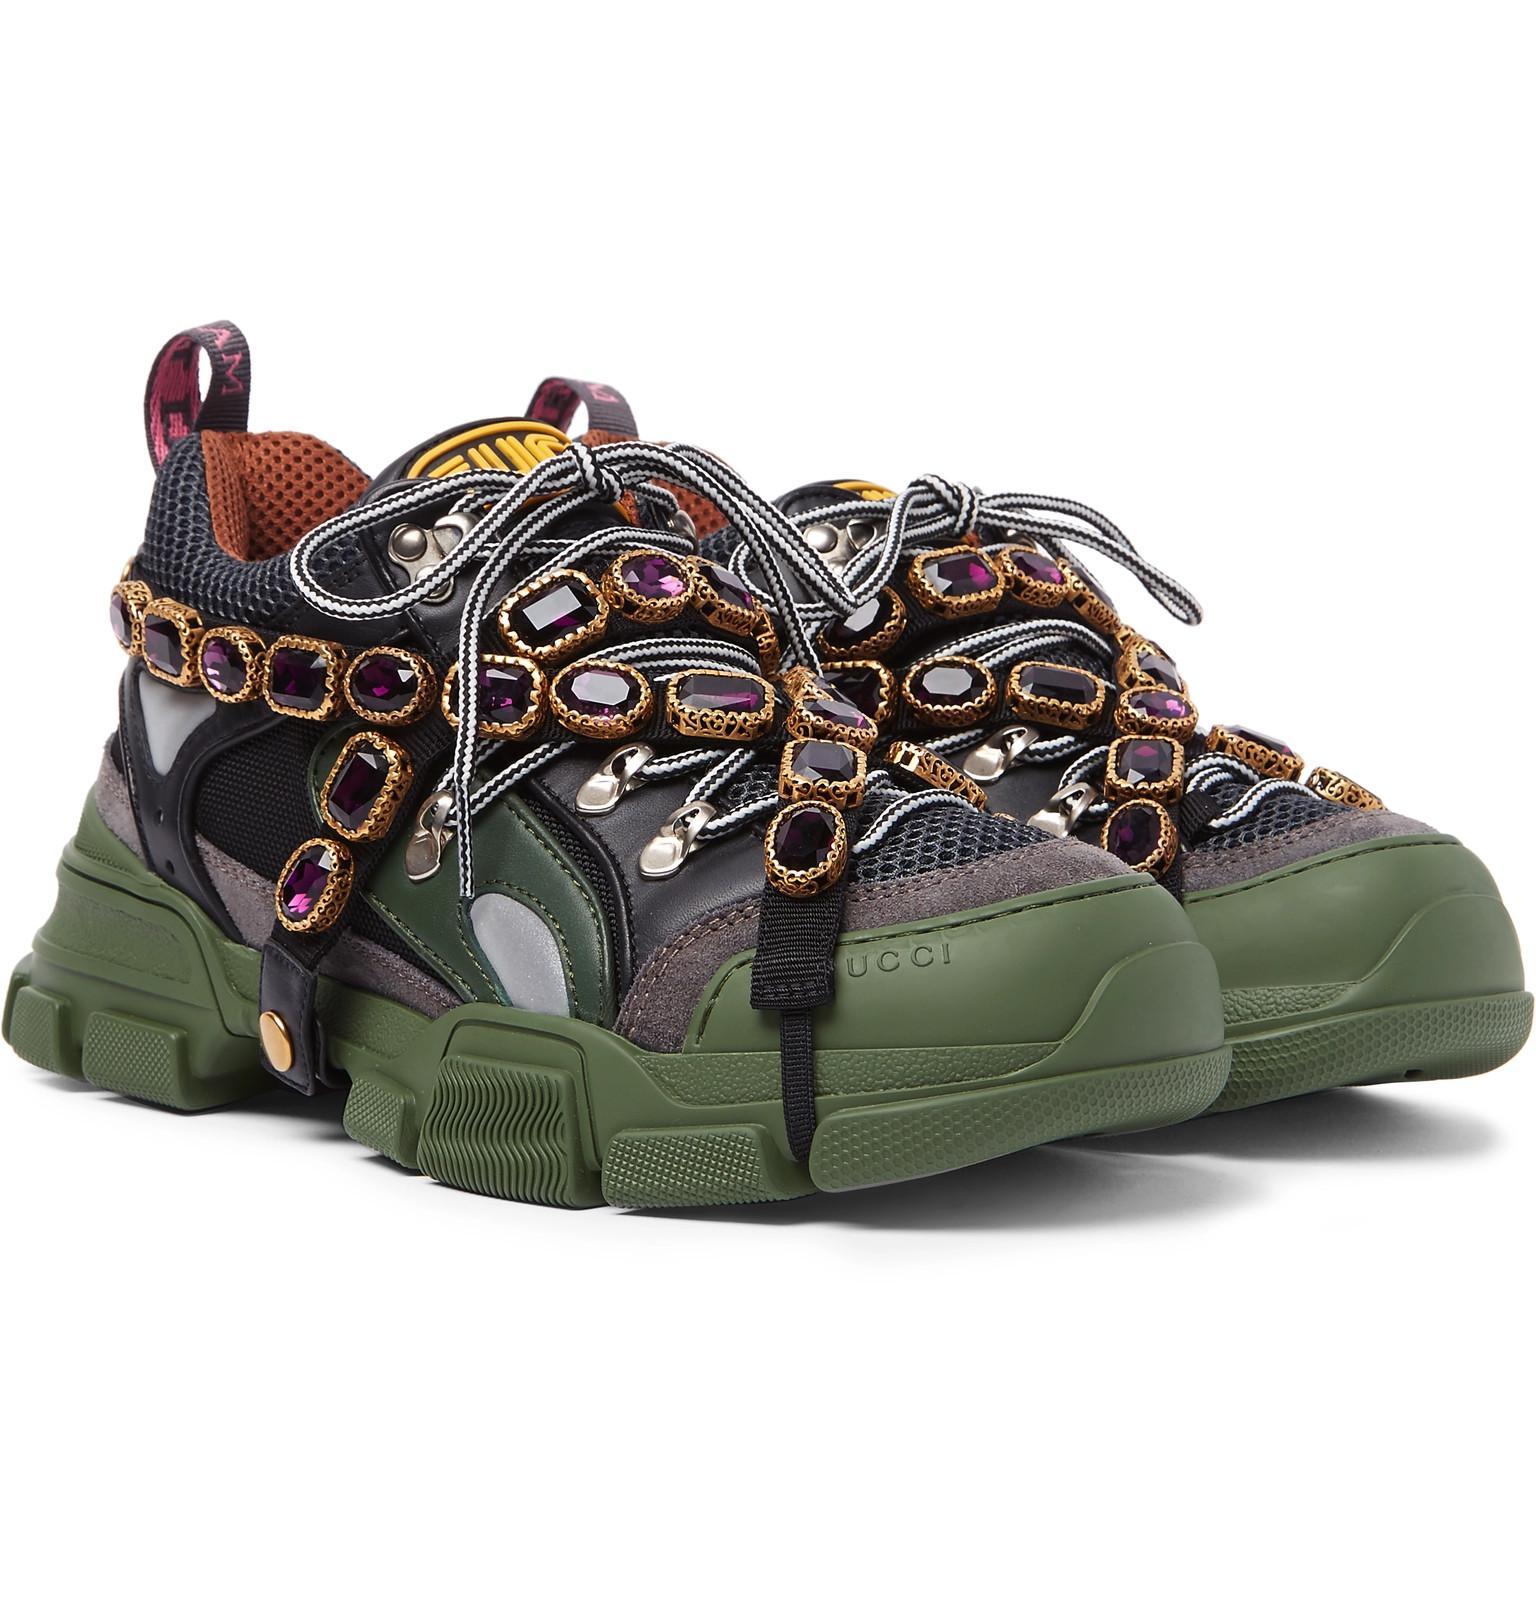 Gucci Leather Men's Flashtrek Sneaker